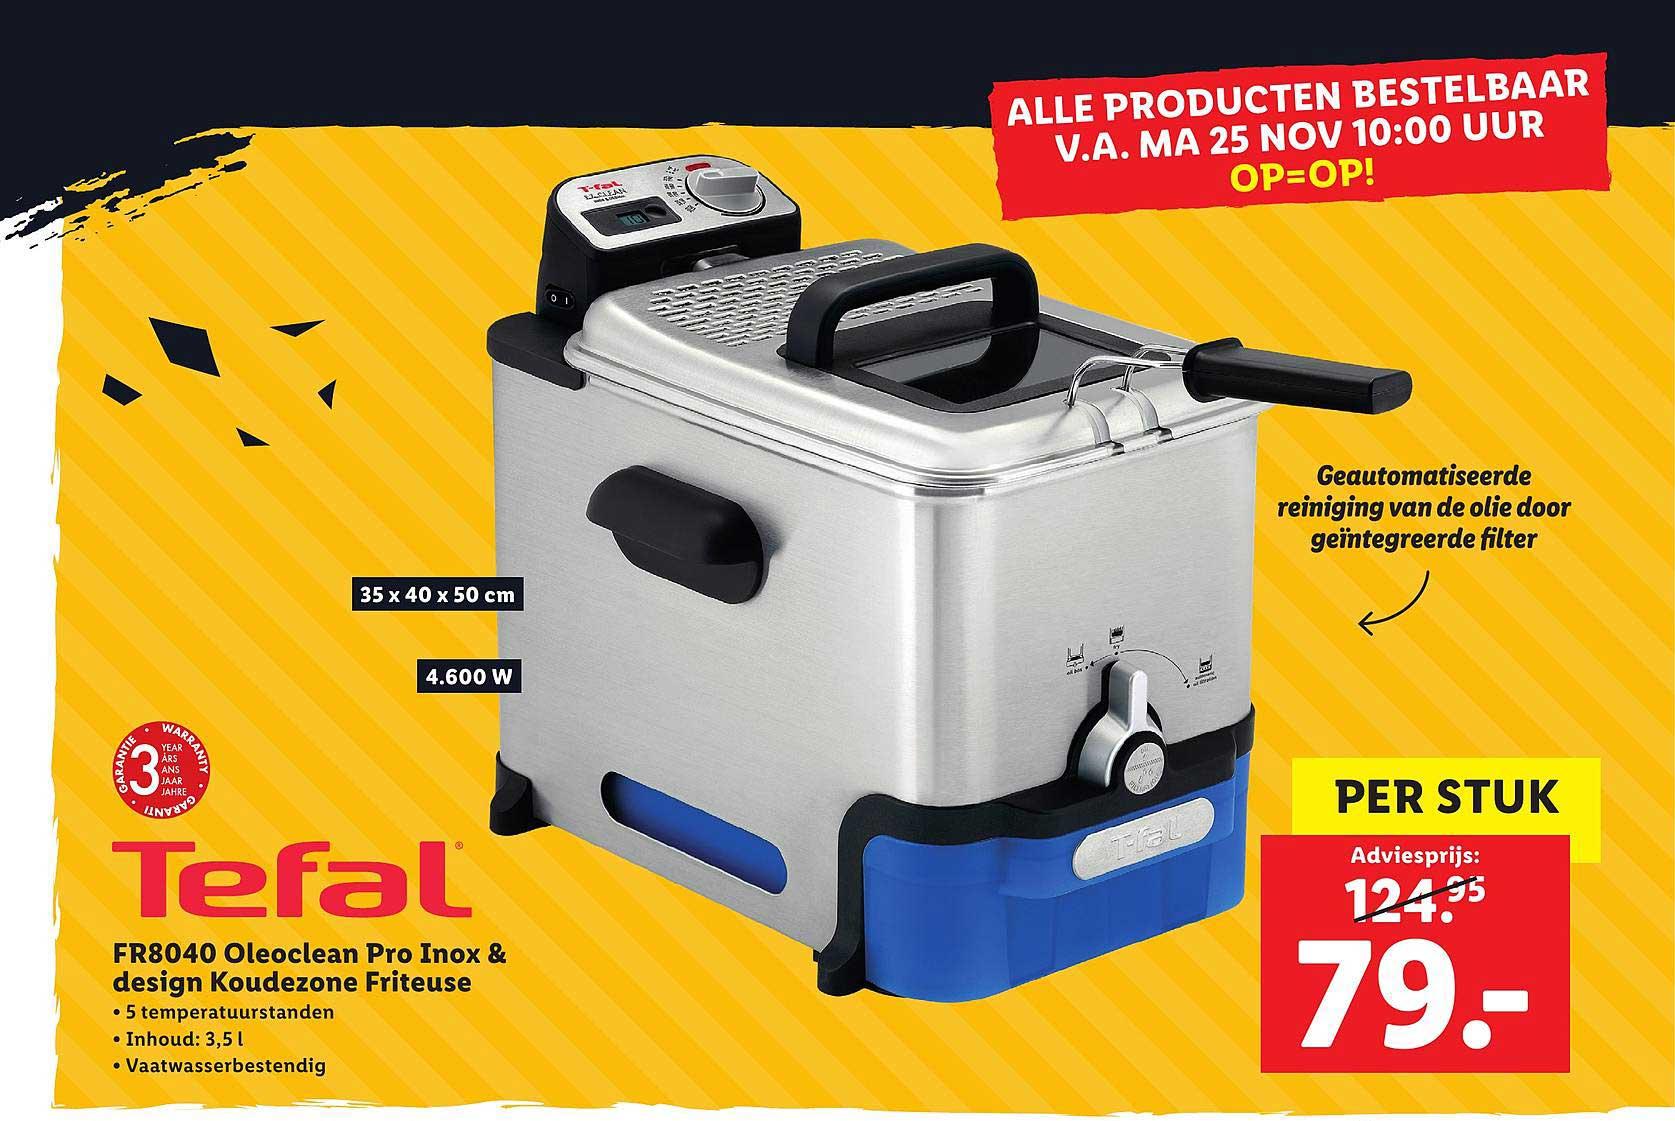 Lidl Shop Tefal FR8040 Oleoclean Pro Inox & Design Koudezone Friteuse